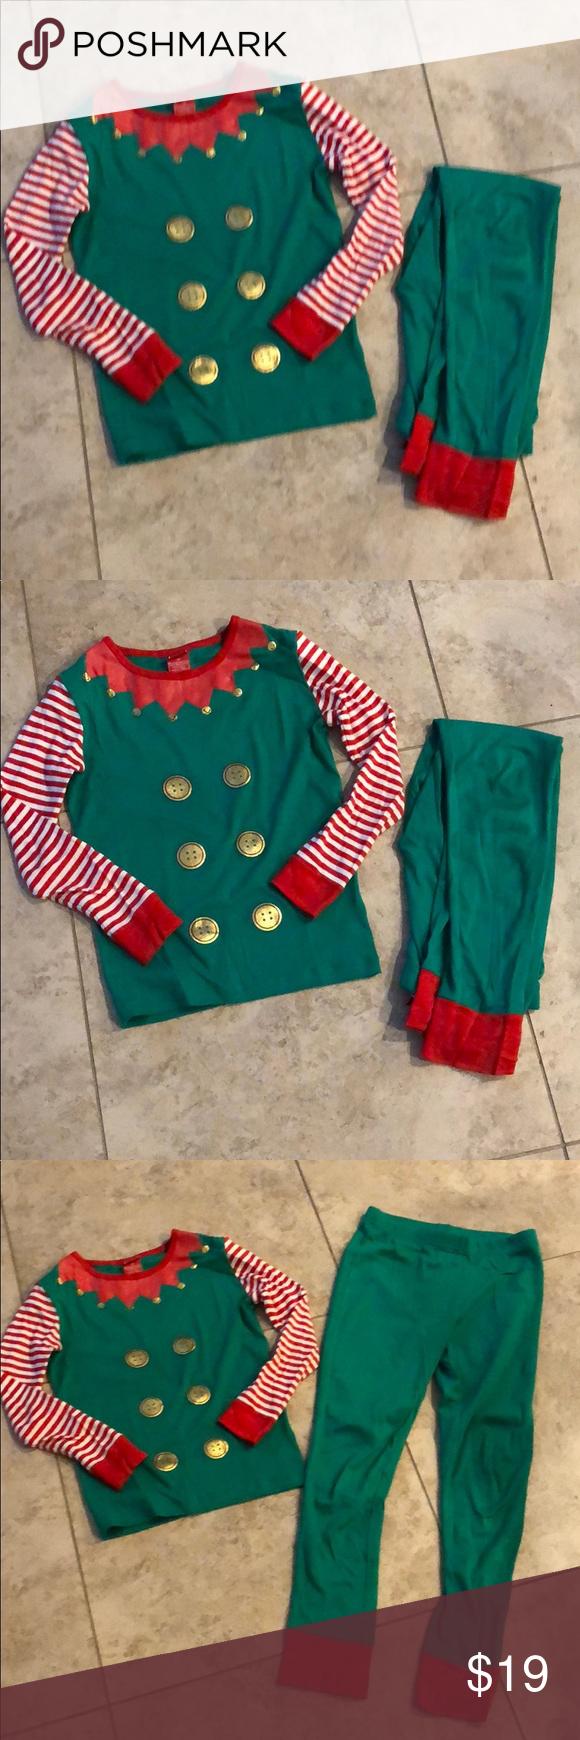 Target Christmas Pajamas Size 10 Target. Only worn once